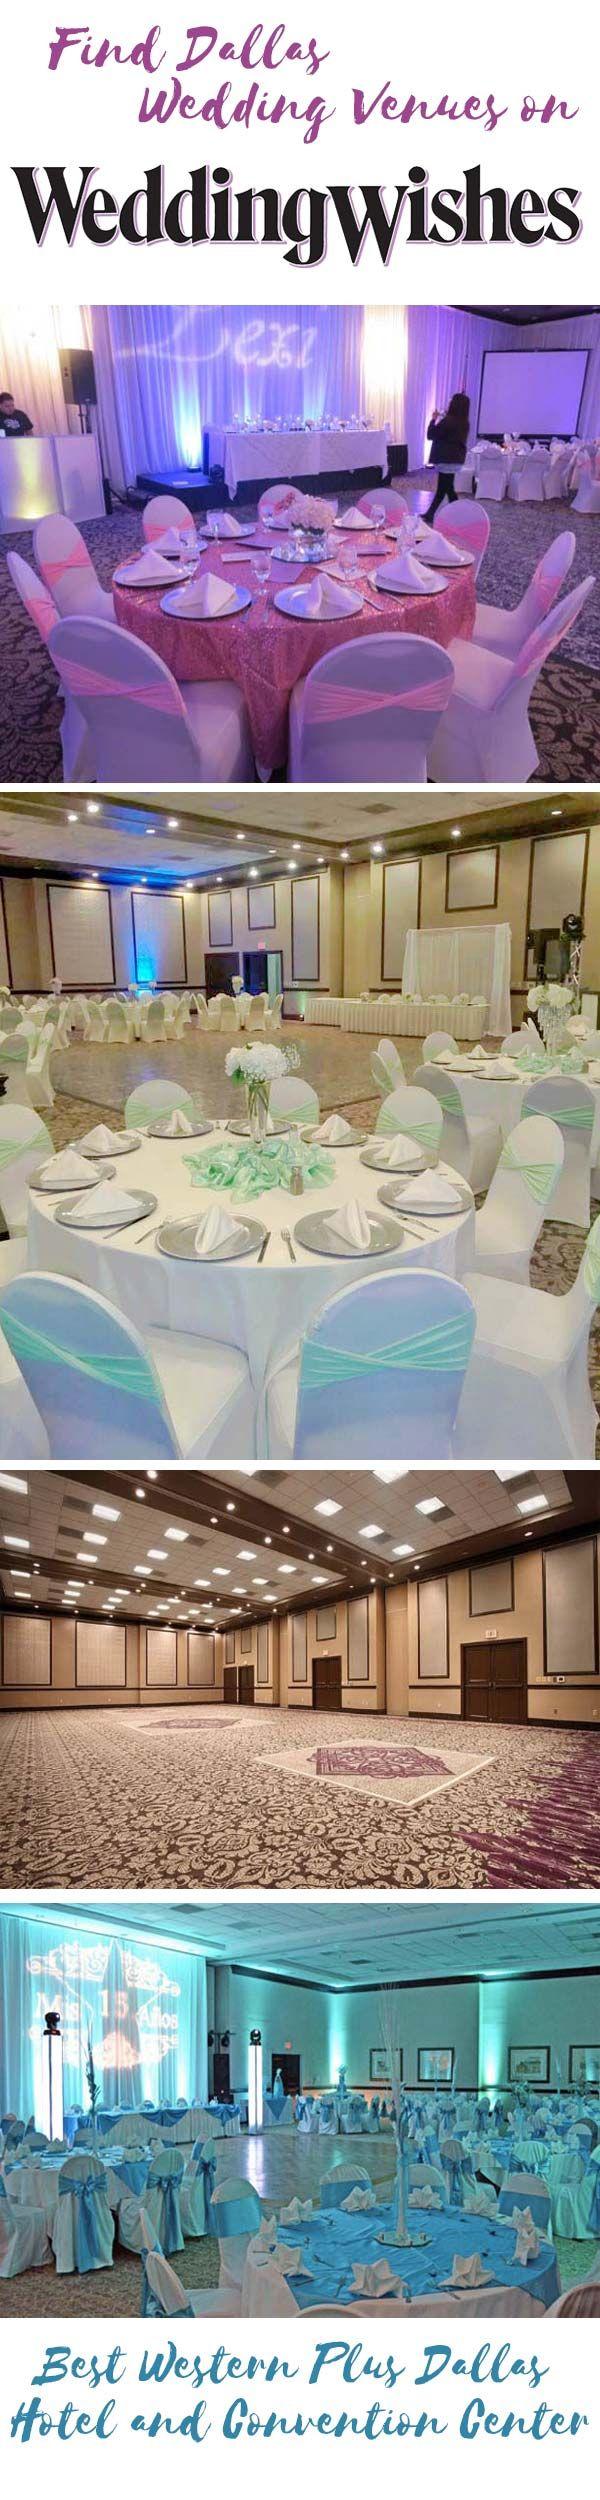 Dallas wedding reception venues/Best Western Plus Dallas Hotel allows outside catering/Dallas wedding hotel